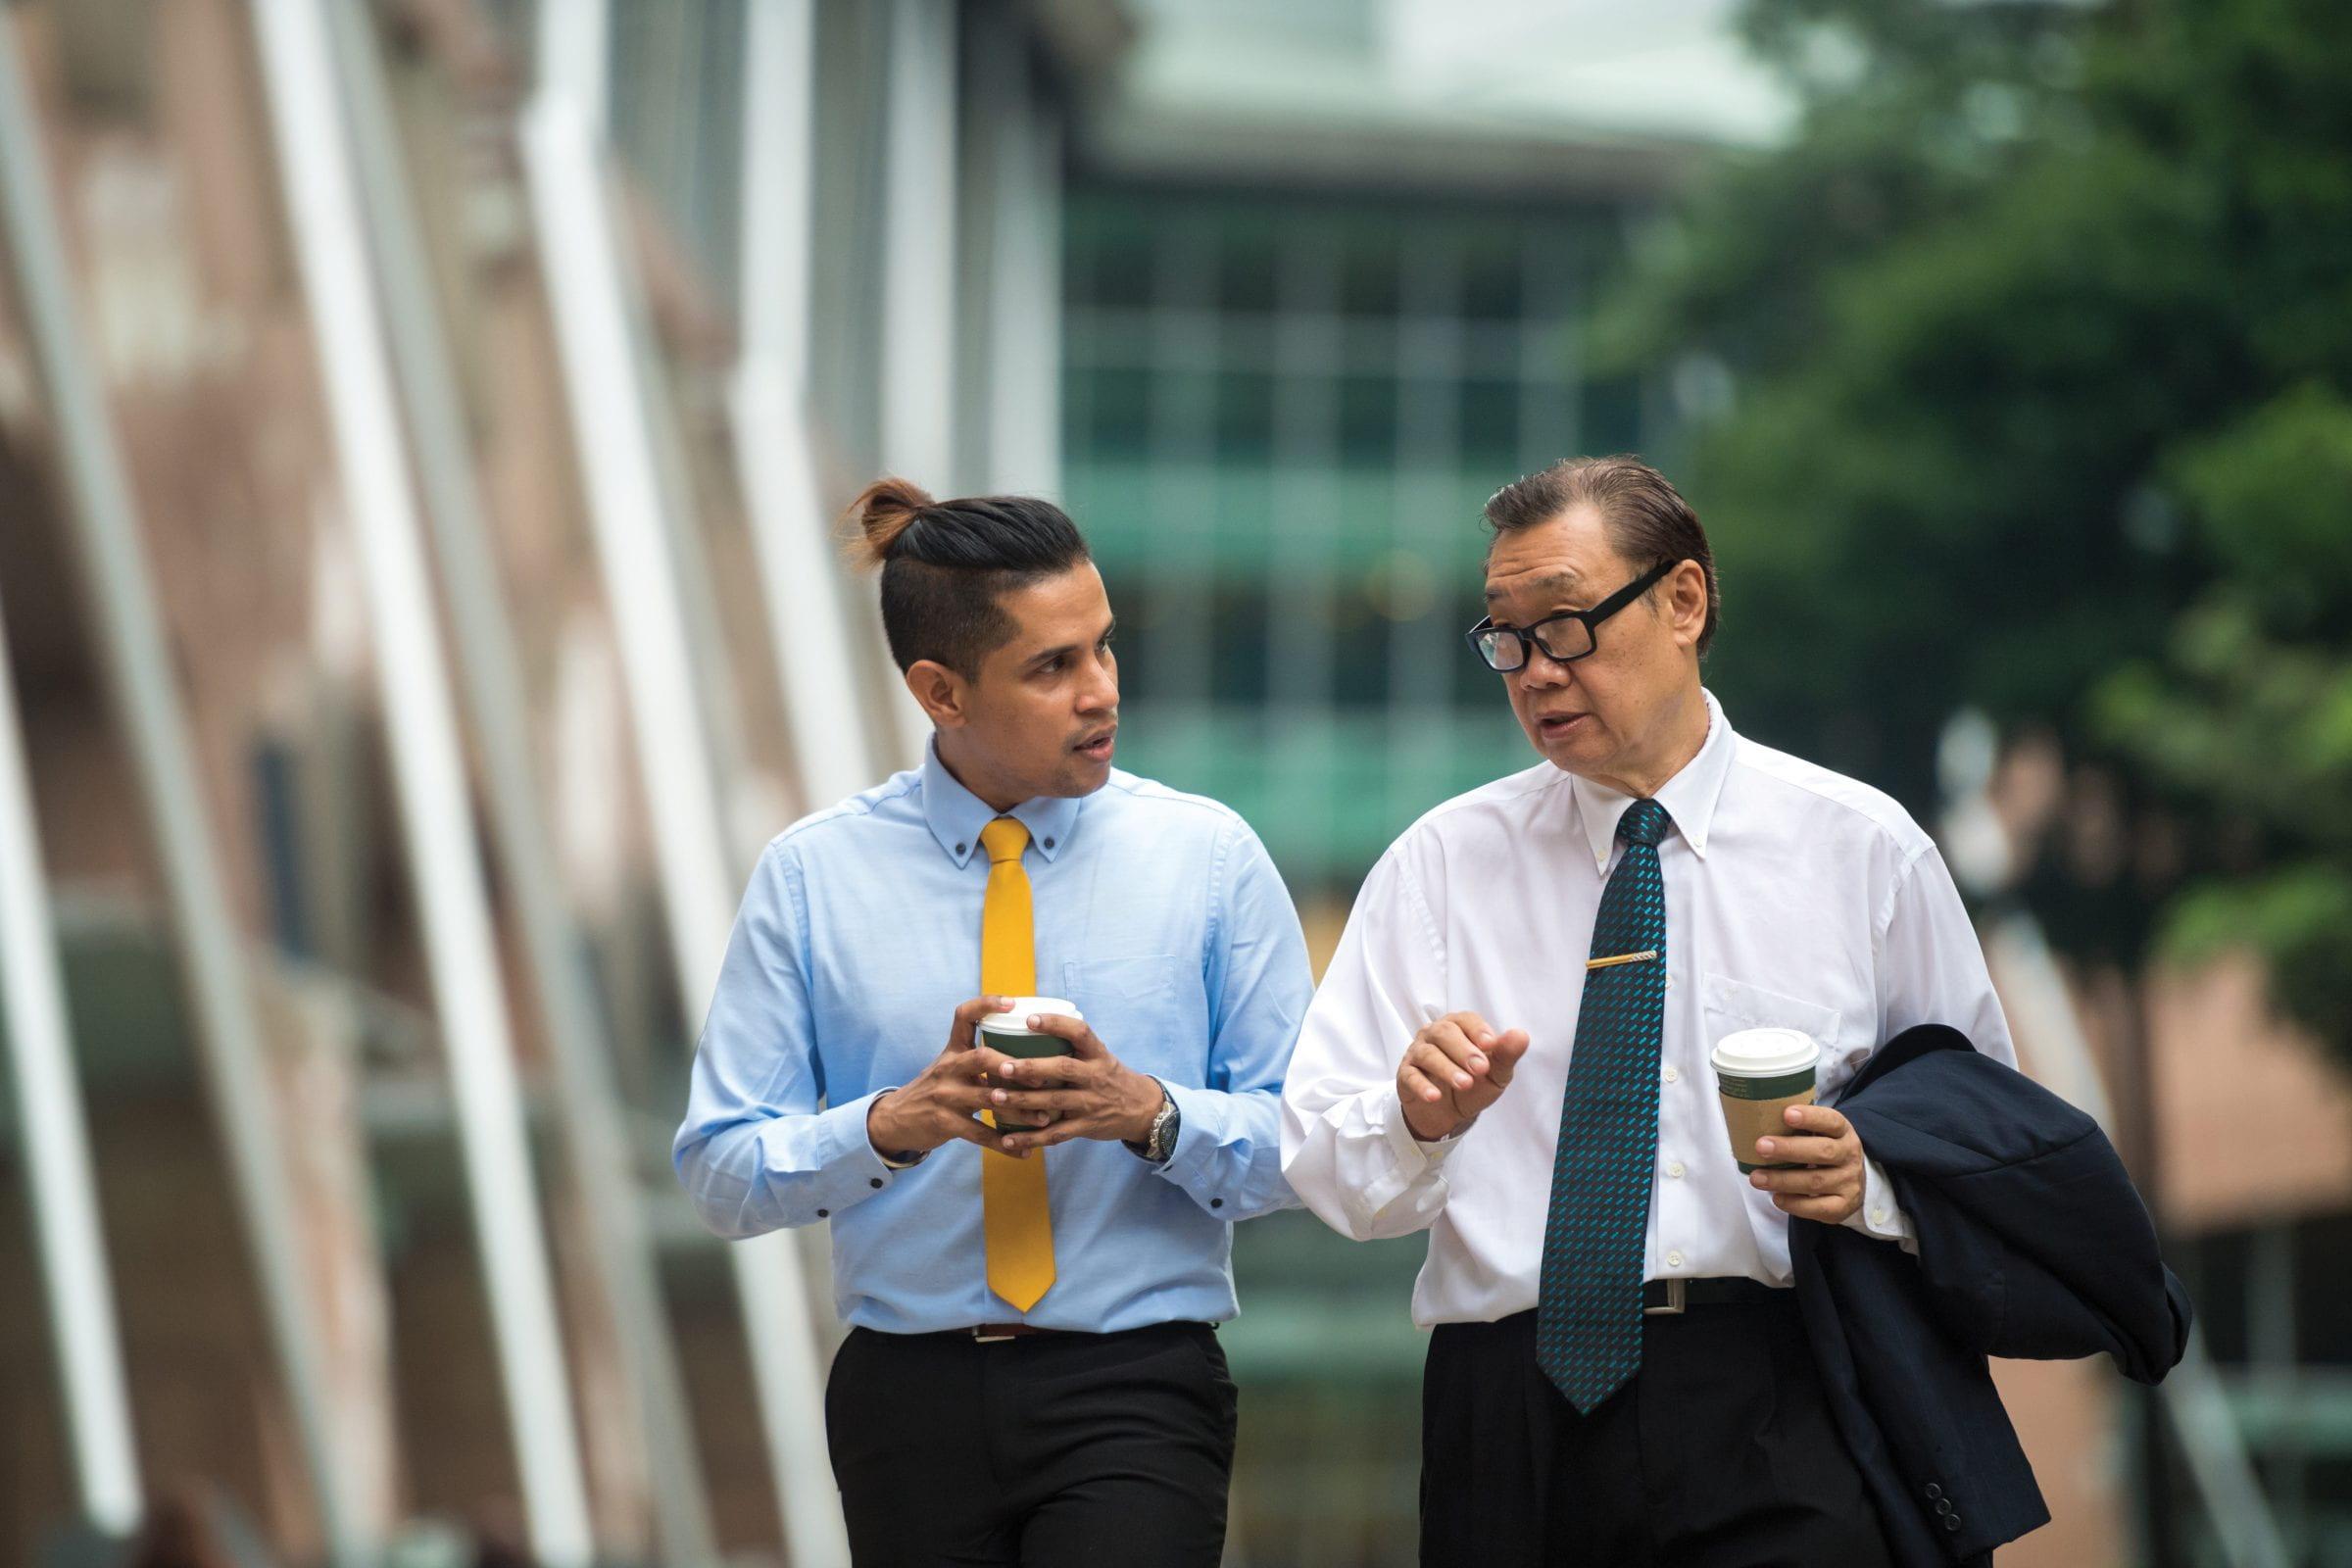 Senior alumni professional mentoring a millennial student